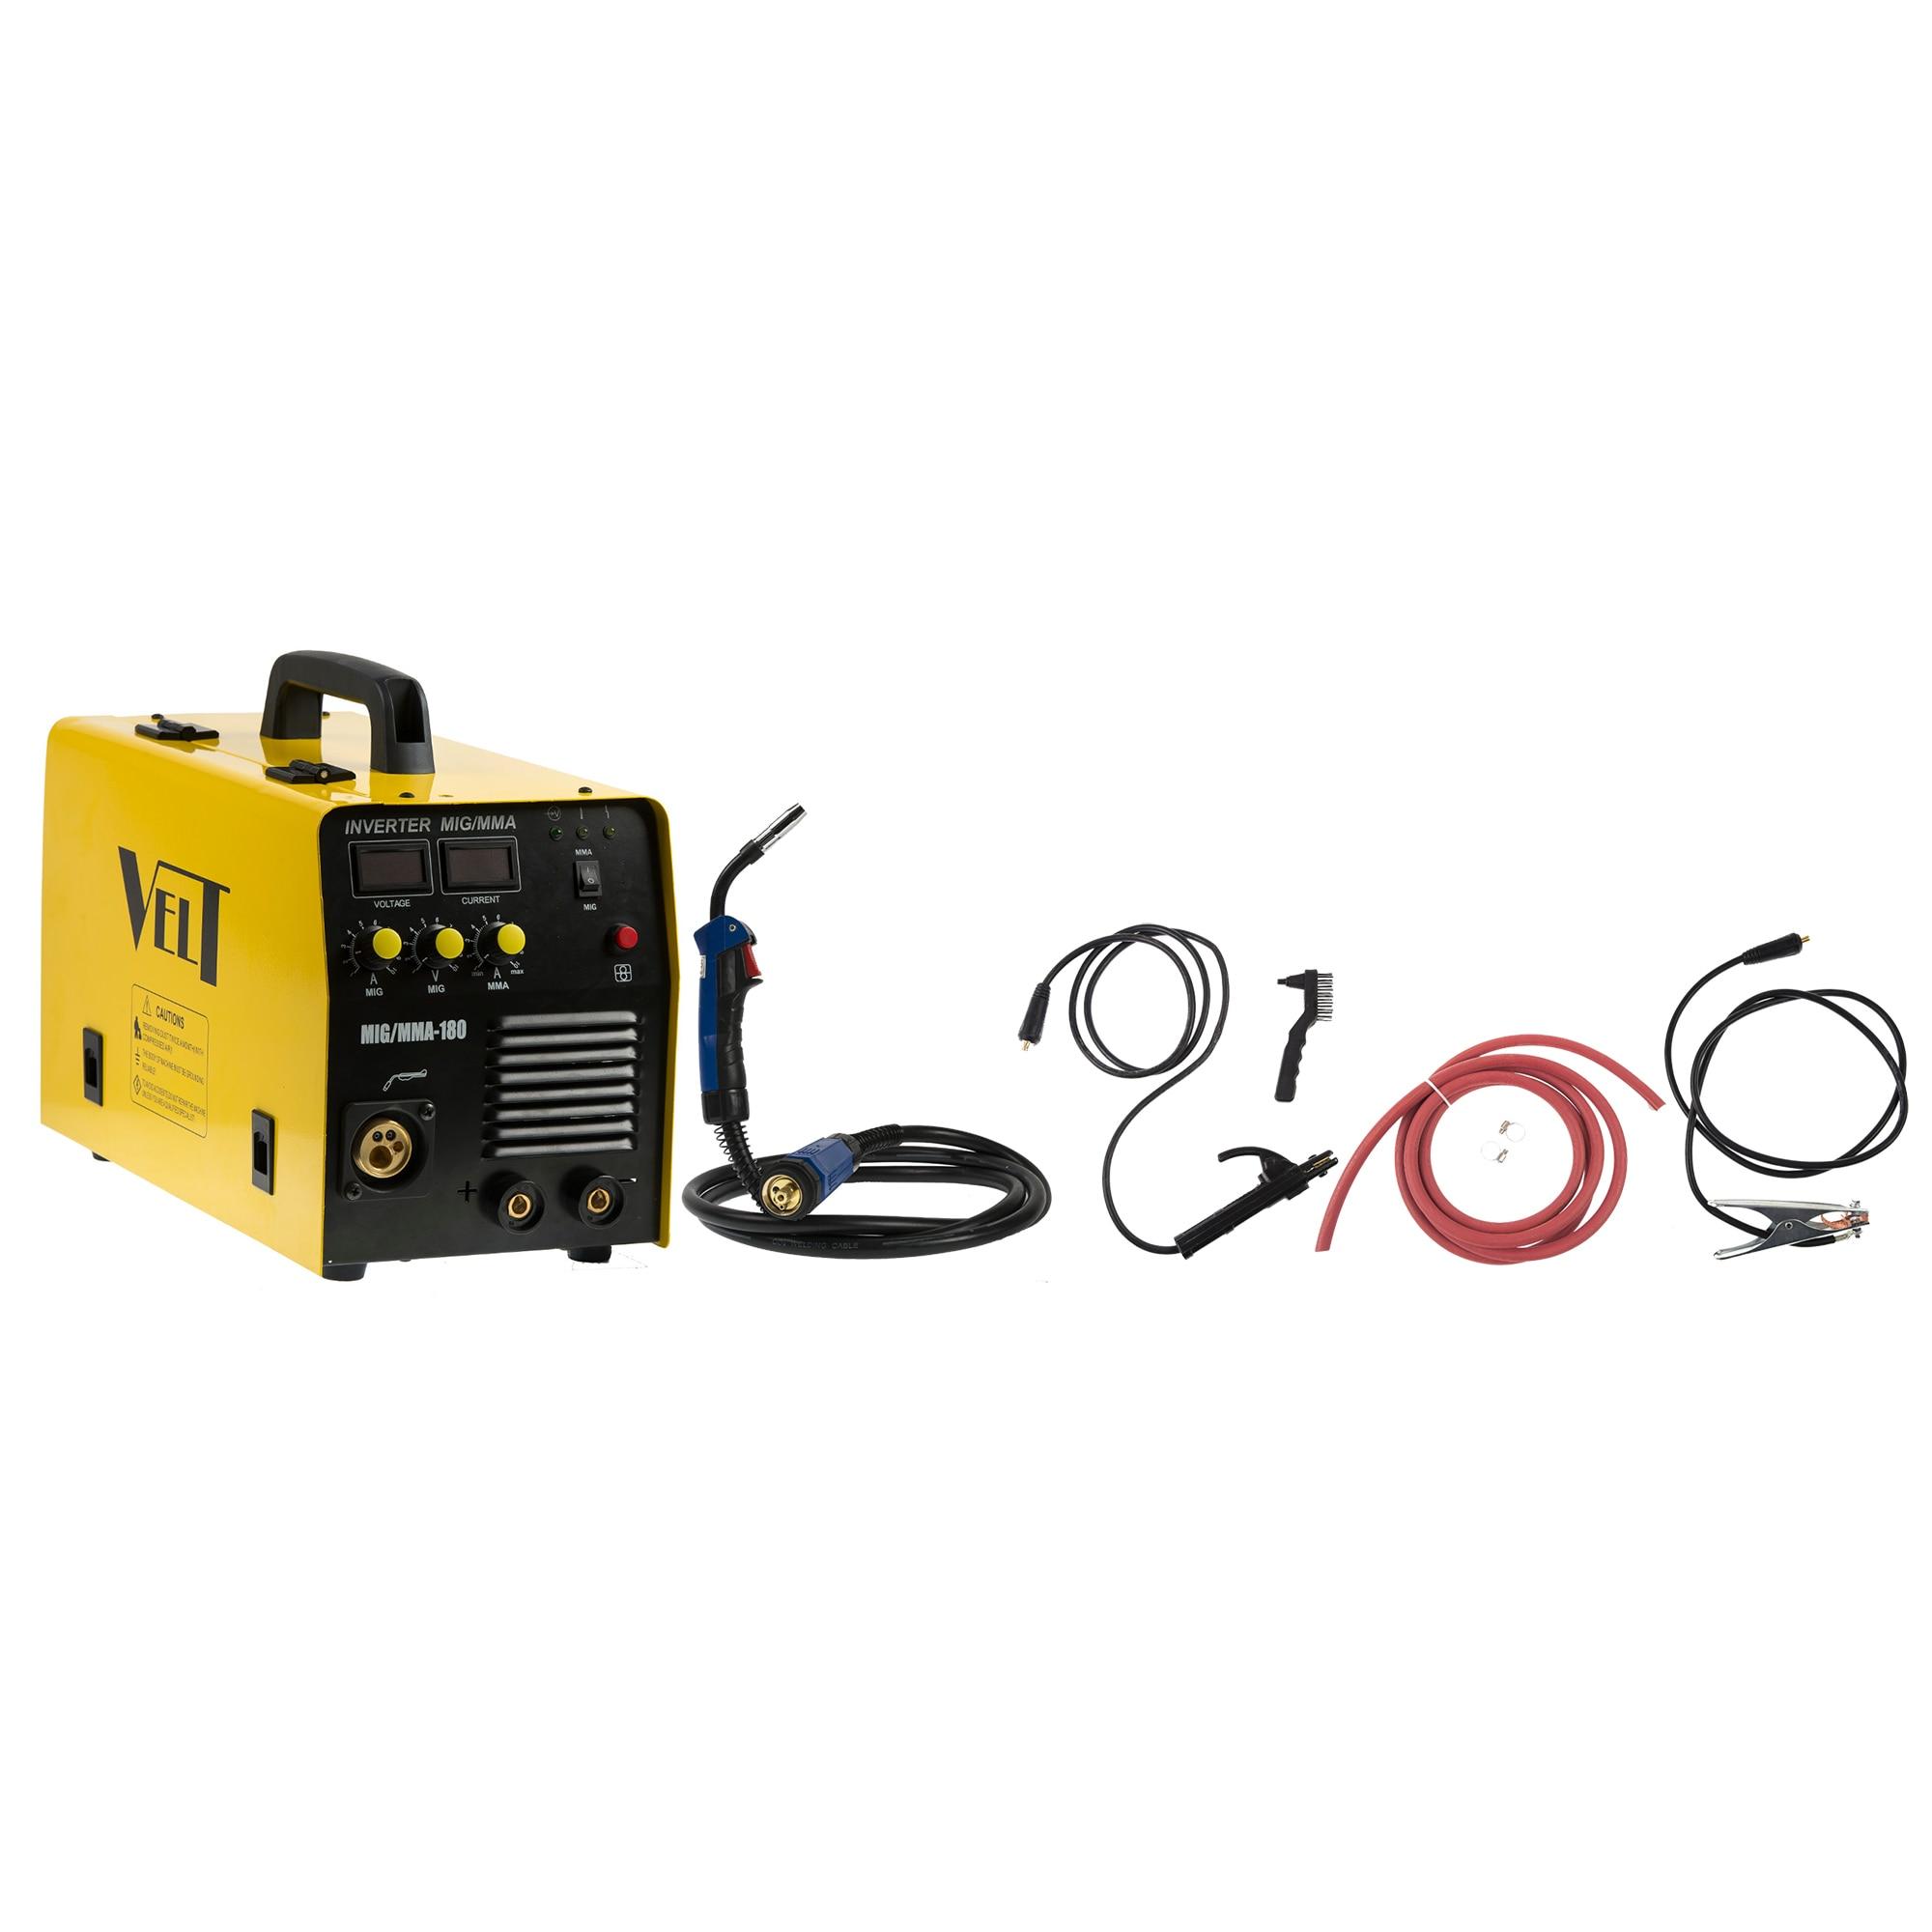 Fotografie Invertor de sudura profesional Velt MIG/MMA 180, 180 A, 230 V, diamentru sarma 0.6-1 mm, 16 kg, accesorii incluse